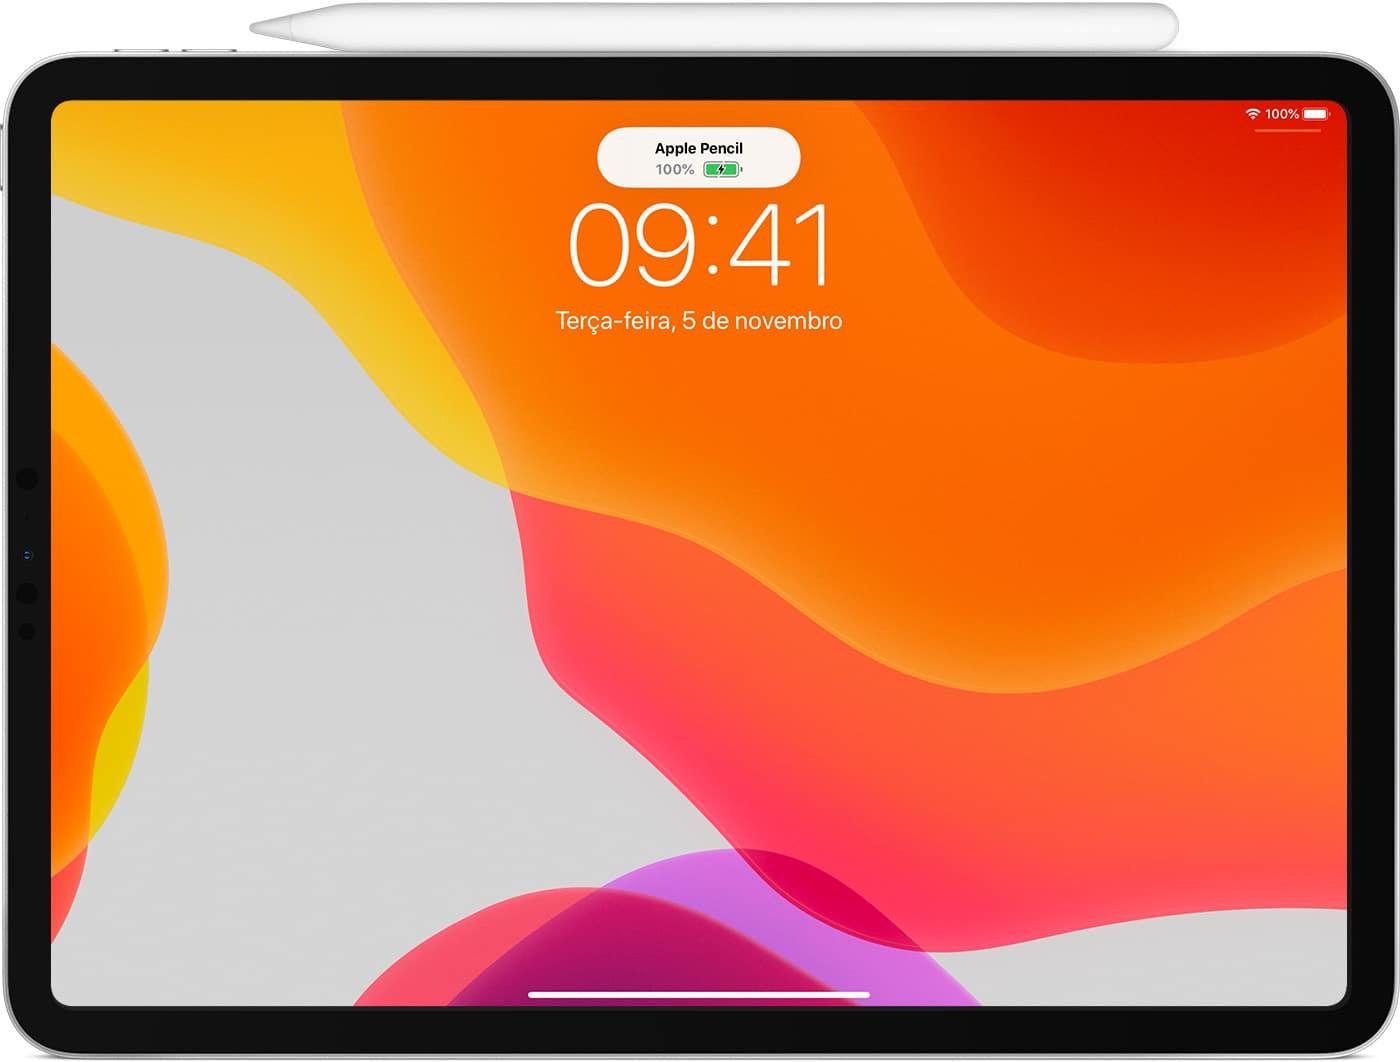 Visualizando a bateria do Apple Pencil no iPad